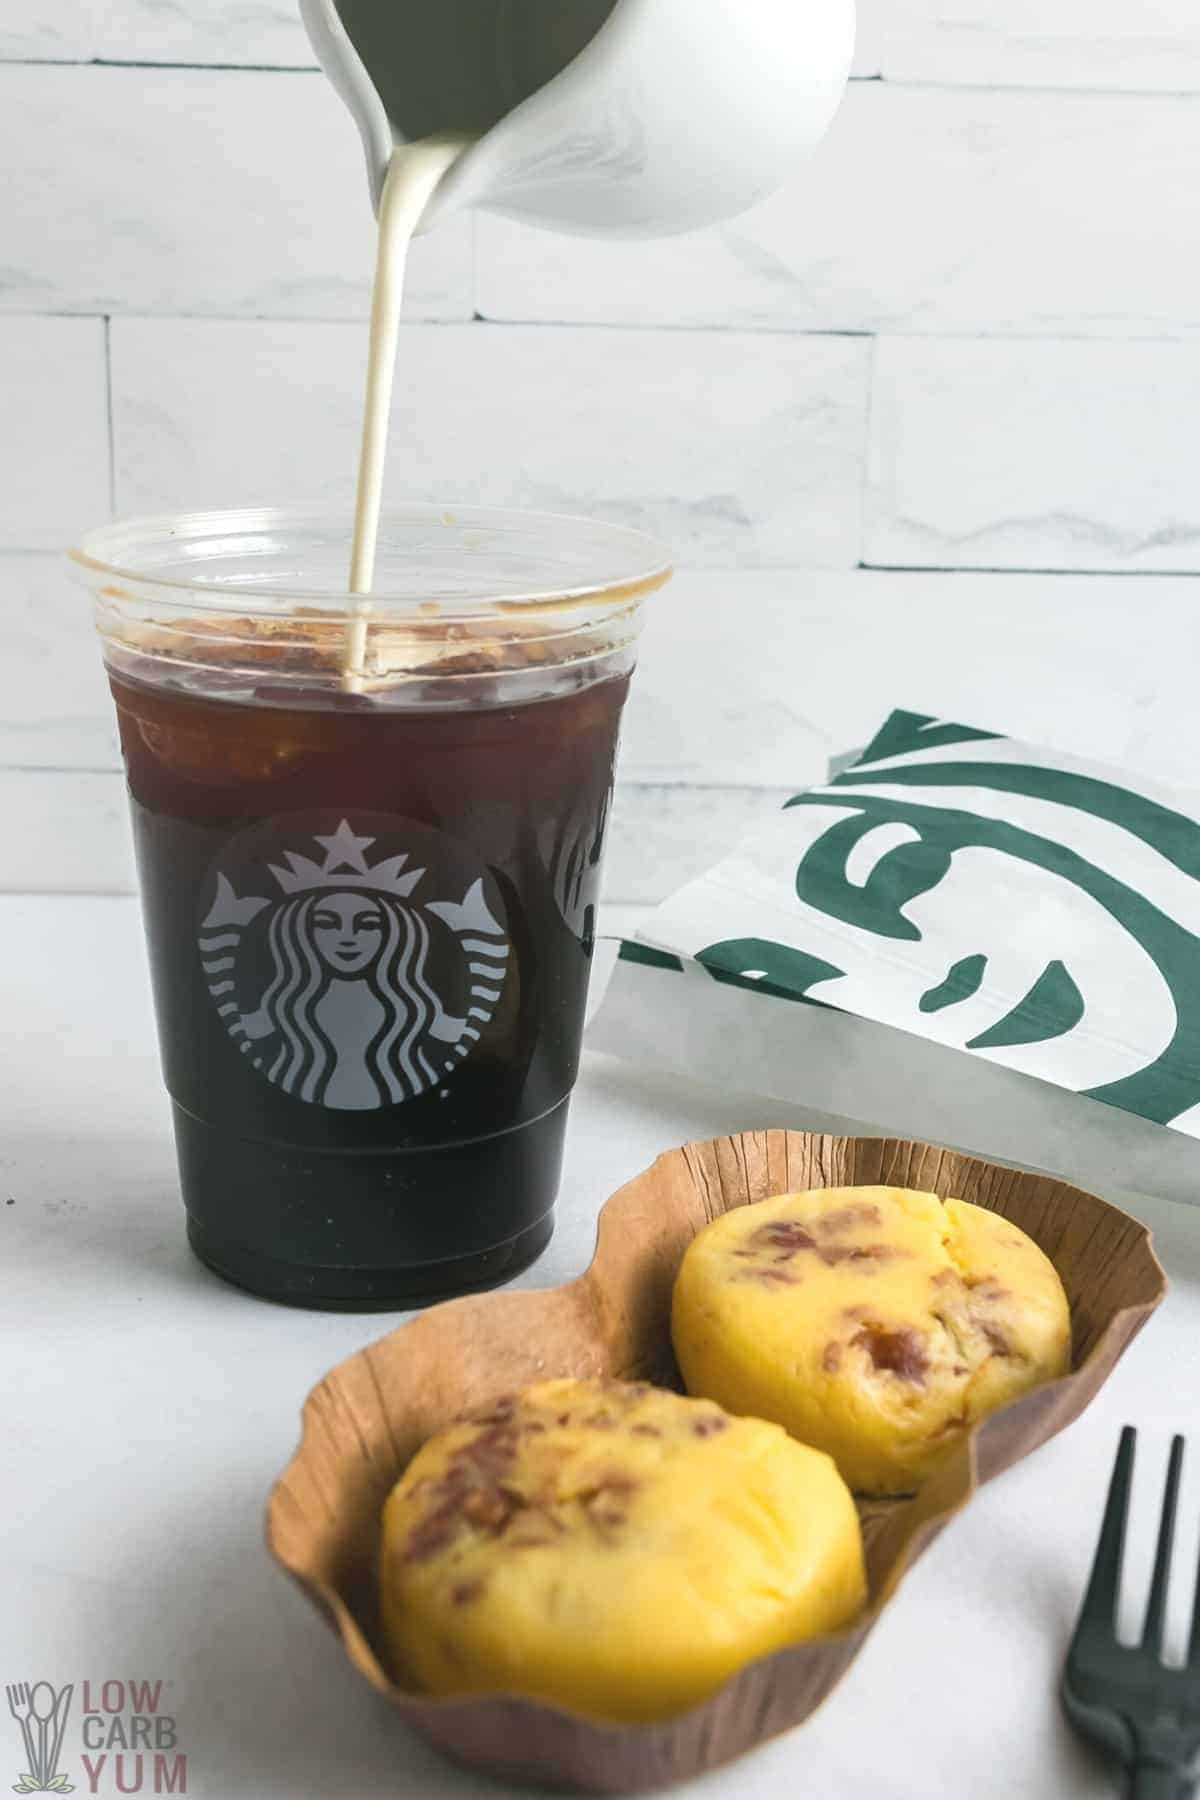 keto starbucks coffee drink with food